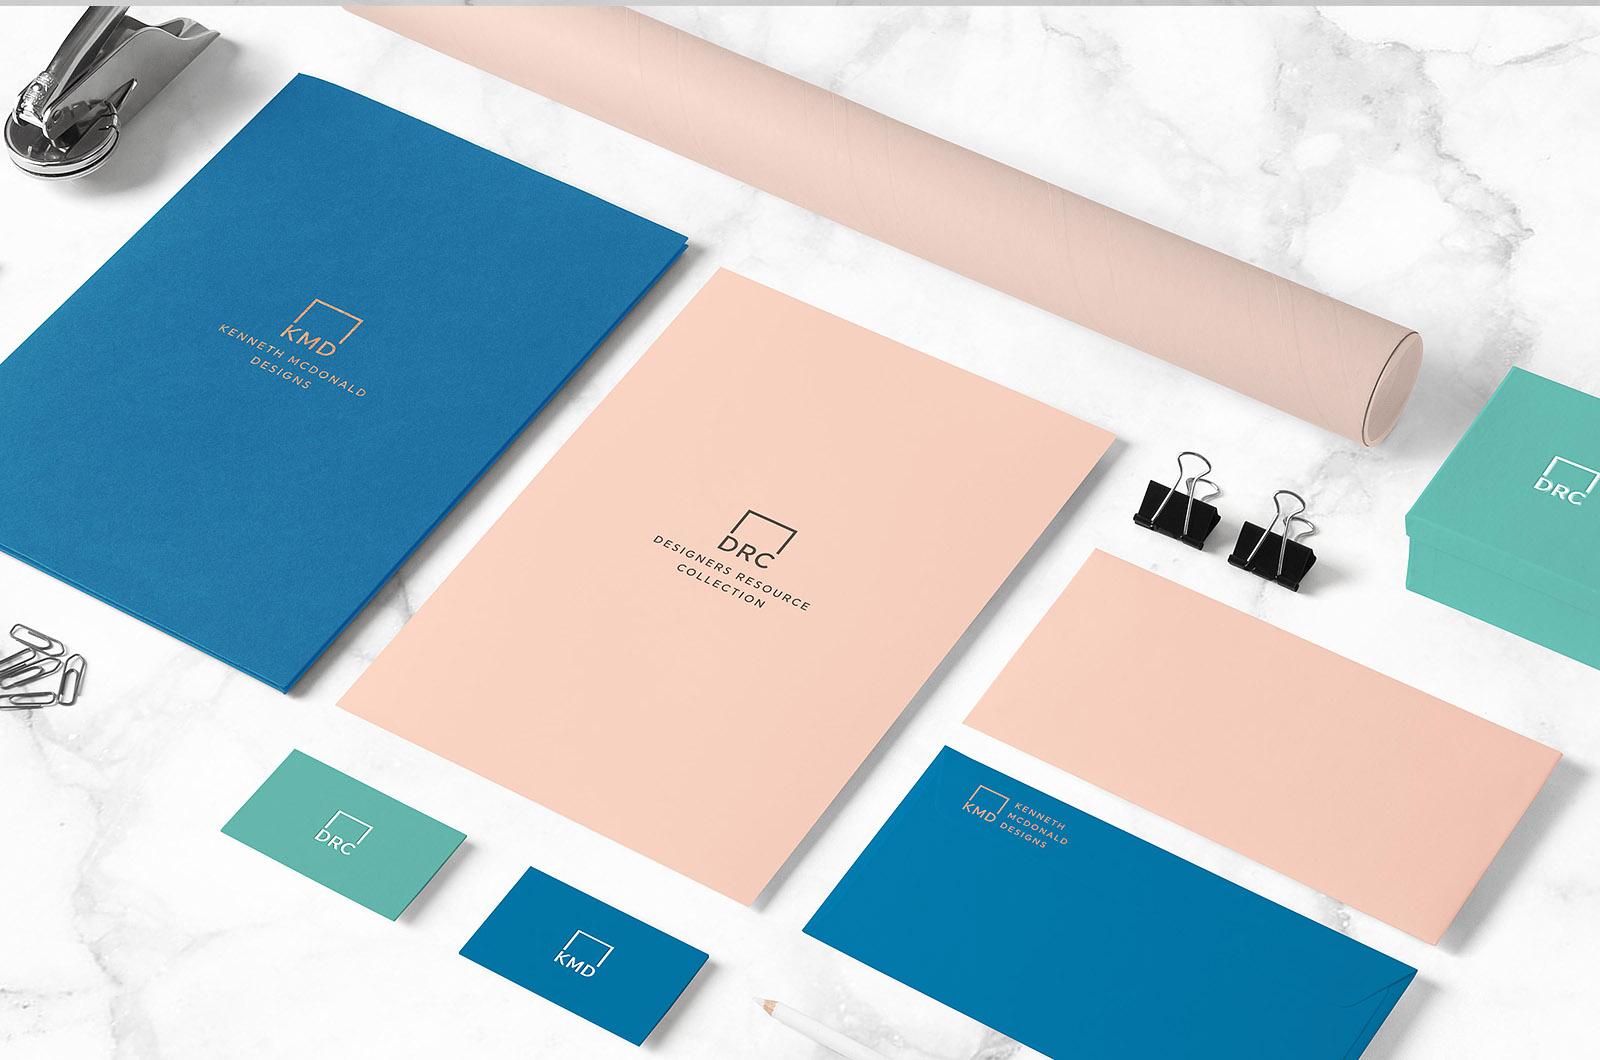 drc-interior-designer-company-branding_08.jpg